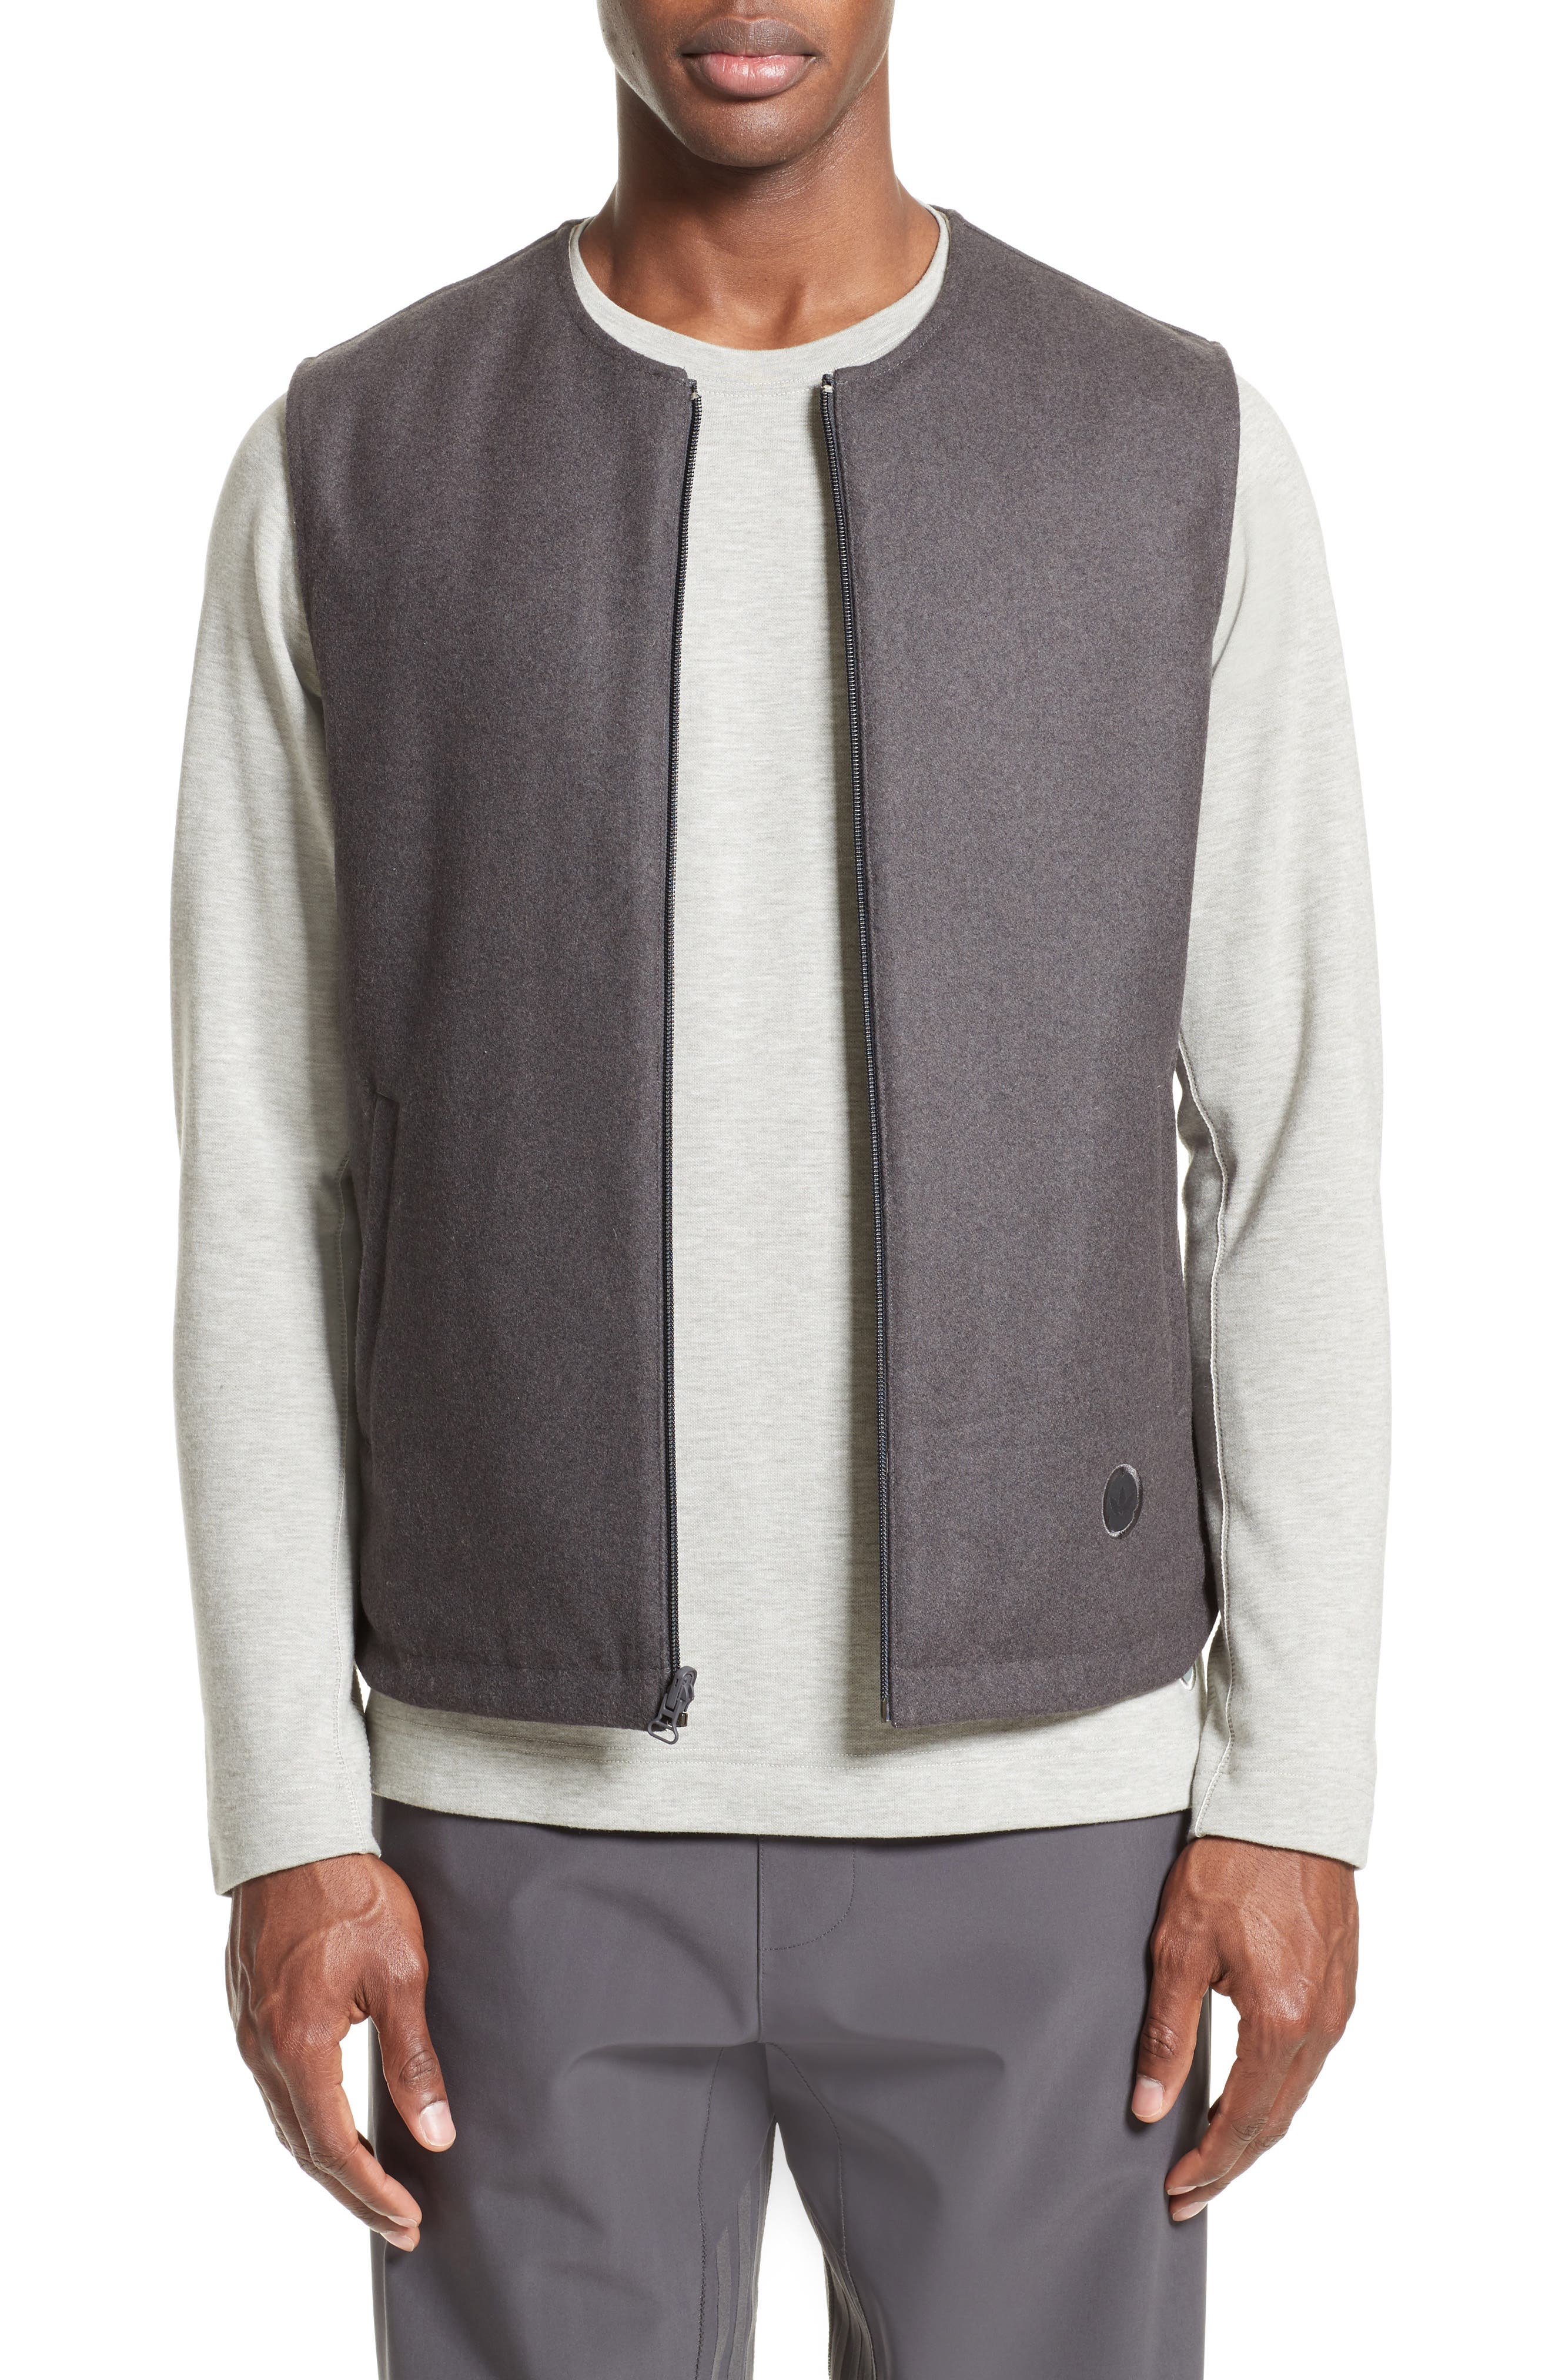 Main Image - wings + horns x adidas Reversible Vest